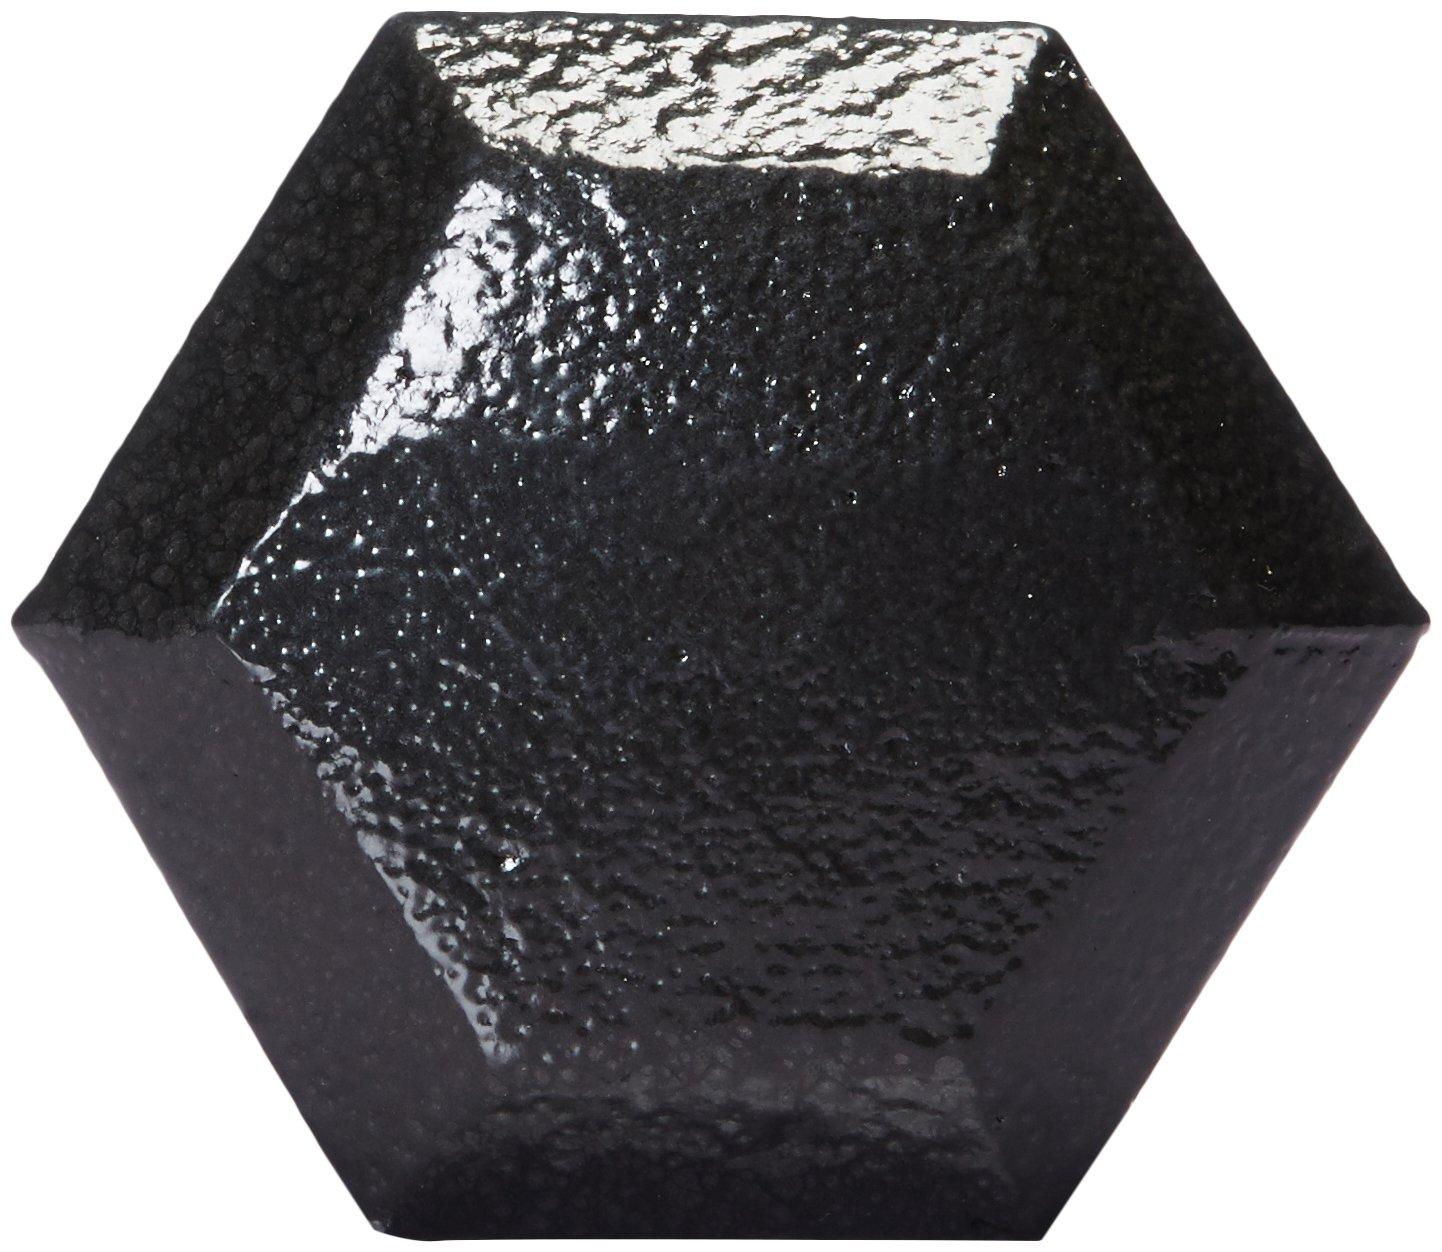 AmazonBasics Cast Iron Hex Dumbbell Weight - 13.4 x 6 x 5.6 Inches, 50 Pounds, Black by AmazonBasics